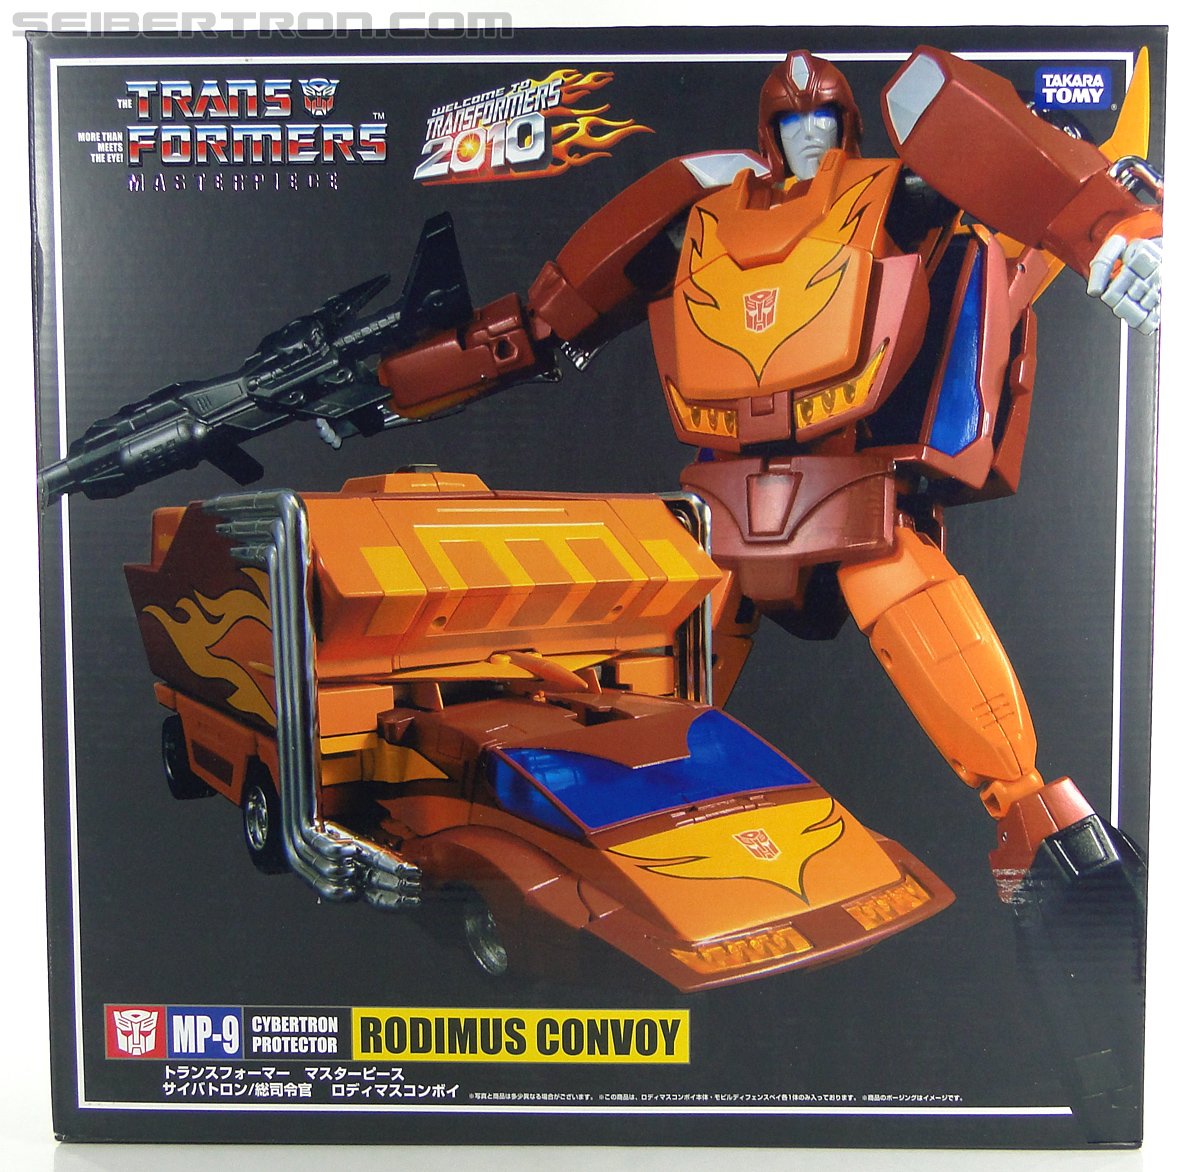 Transformers Masterpiece Rodimus Prime (MP-09) (Rodimus Convoy (MP-09)) (Image #1 of 515)